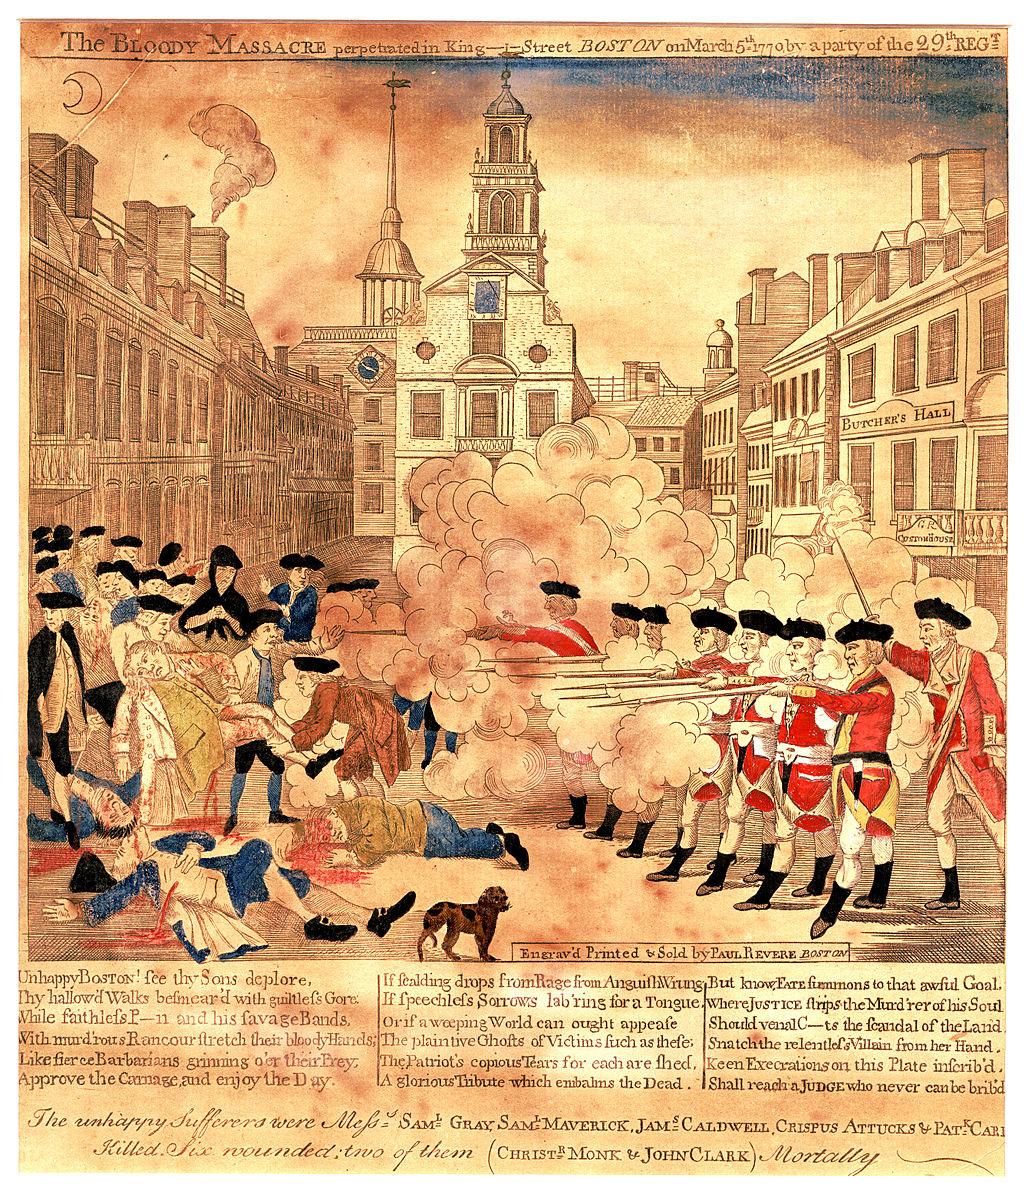 a history of the boston massacre